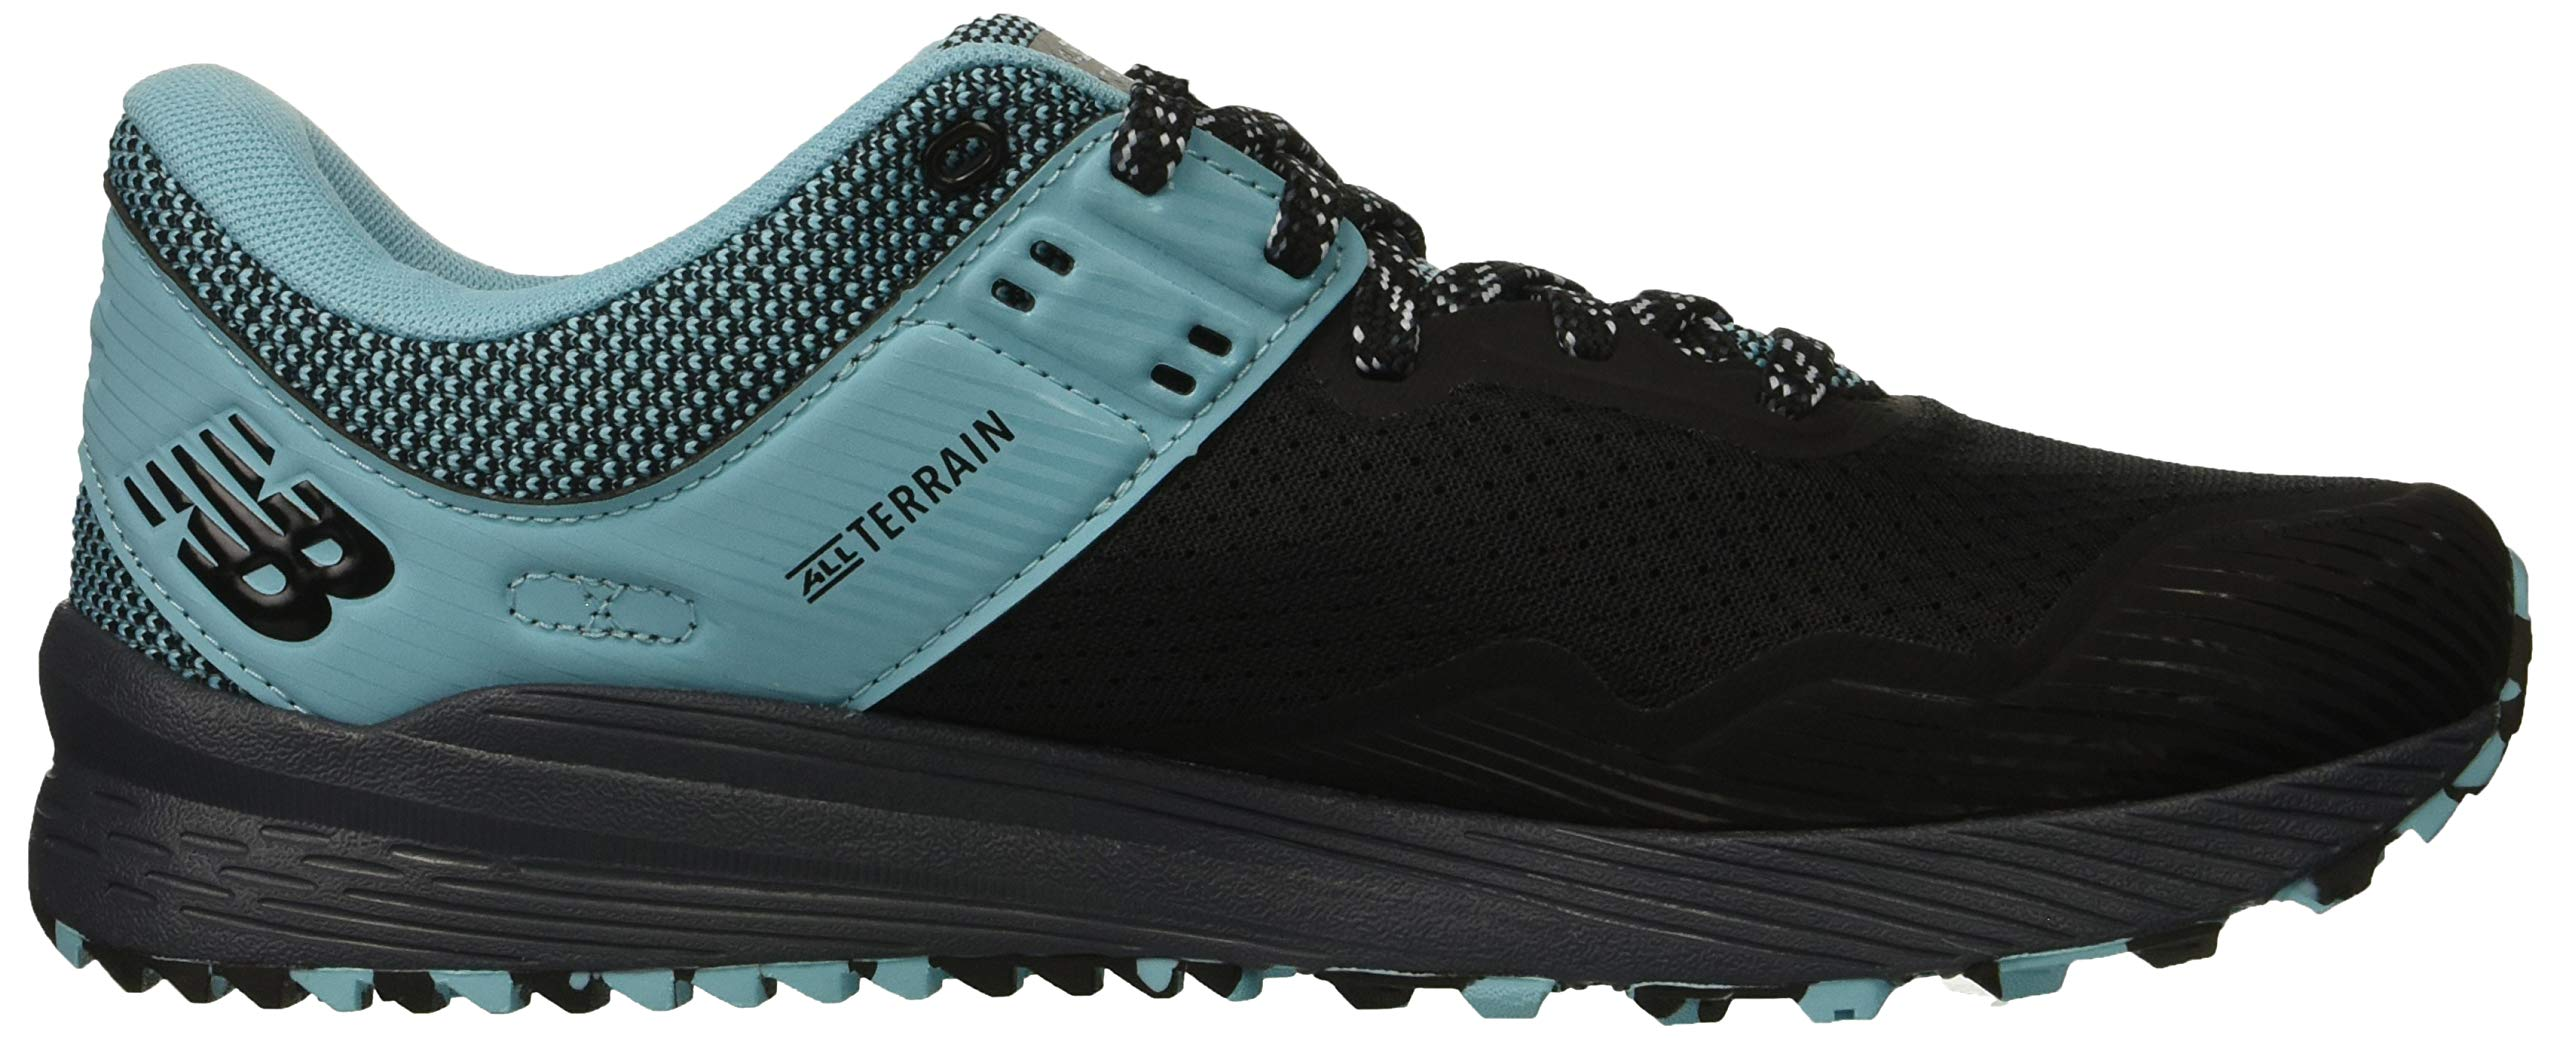 New Balance Women's Nitrel V2 FuelCore Trail Running Shoe Black/Thunder/Enamel Blue 5.5 B US by New Balance (Image #7)